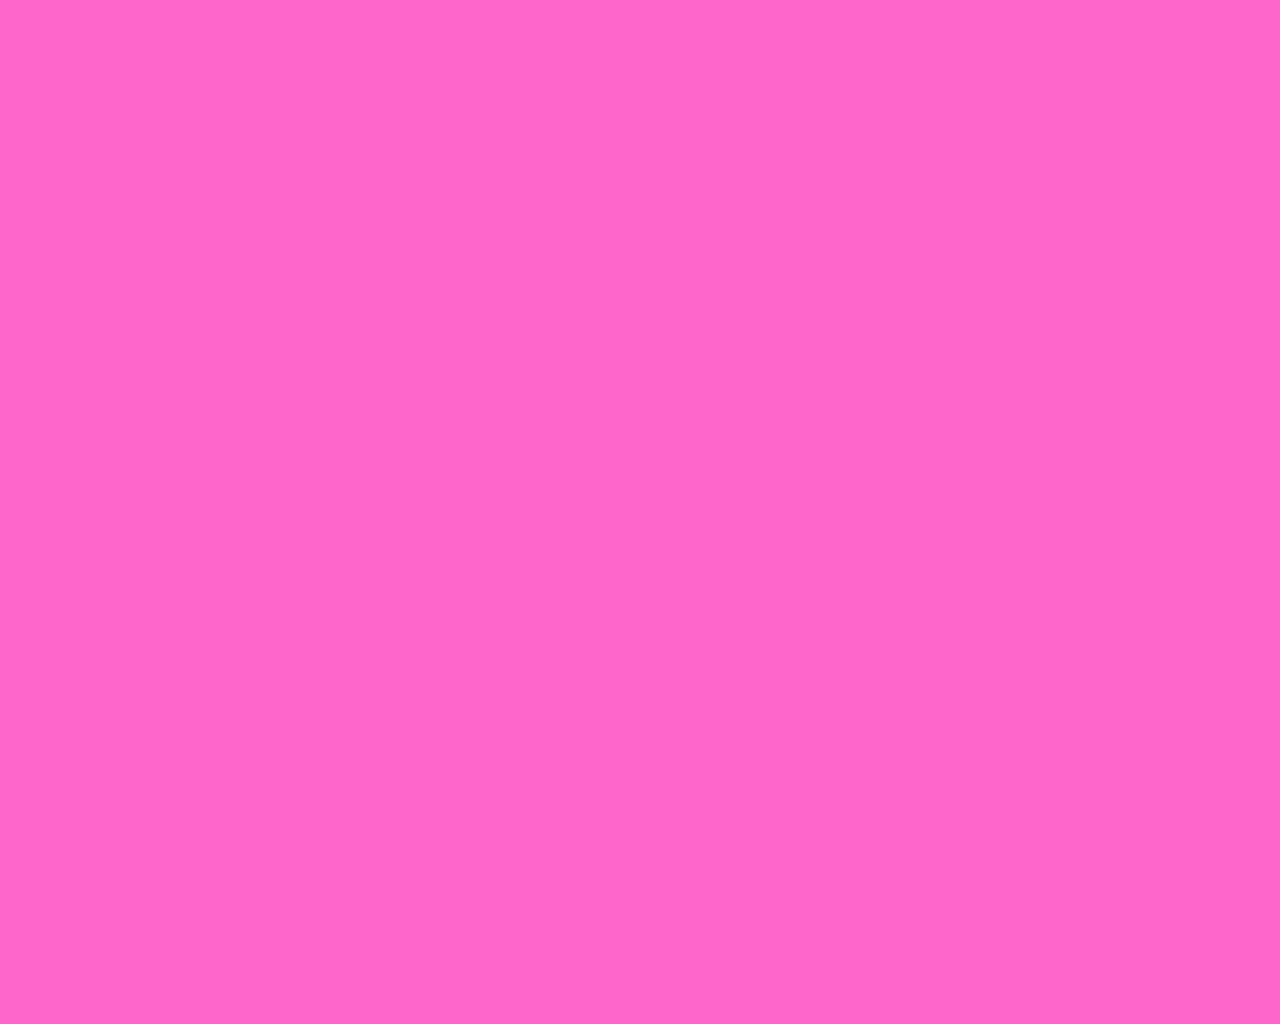 1280x1024 Rose Pink Solid Color Background